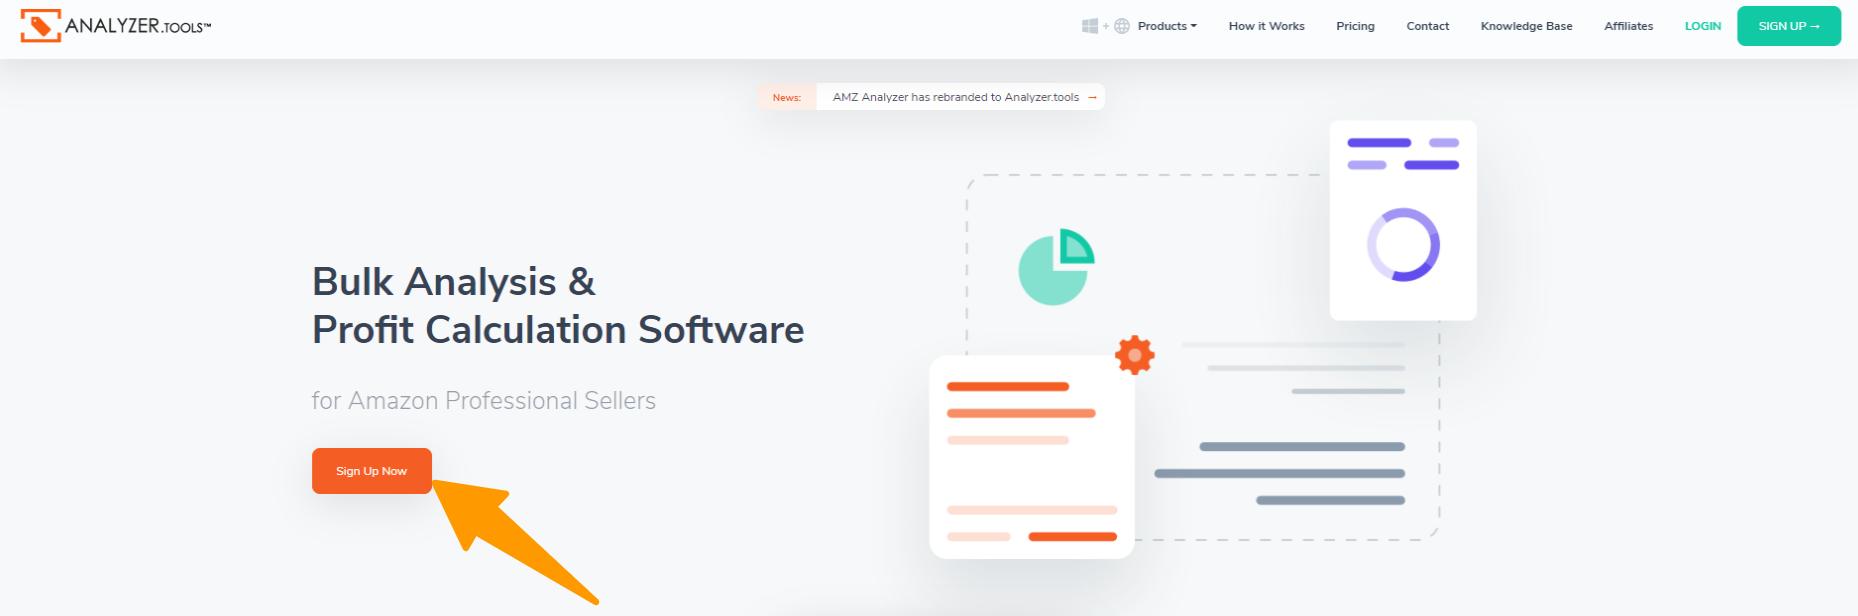 Analyzer.Tools - Overview